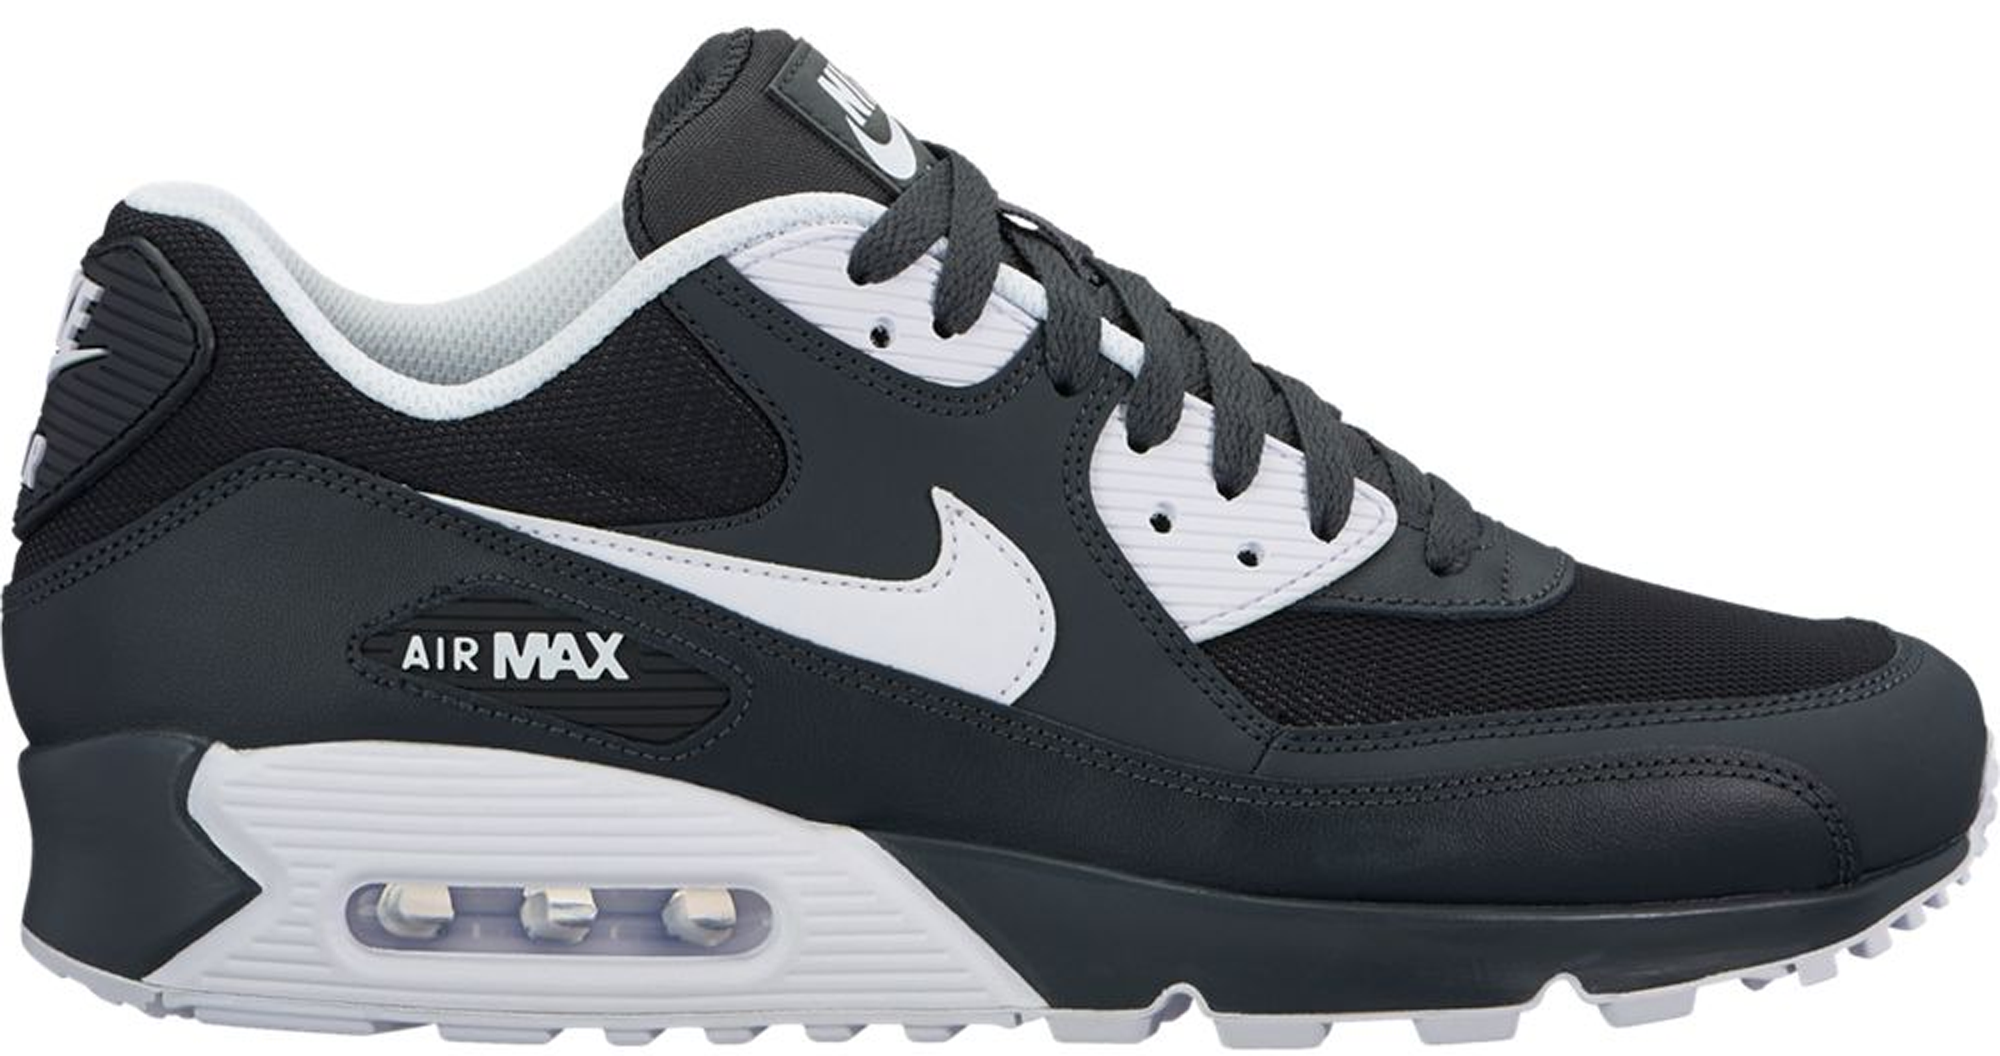 Nike Air Max 90 Black White (2018